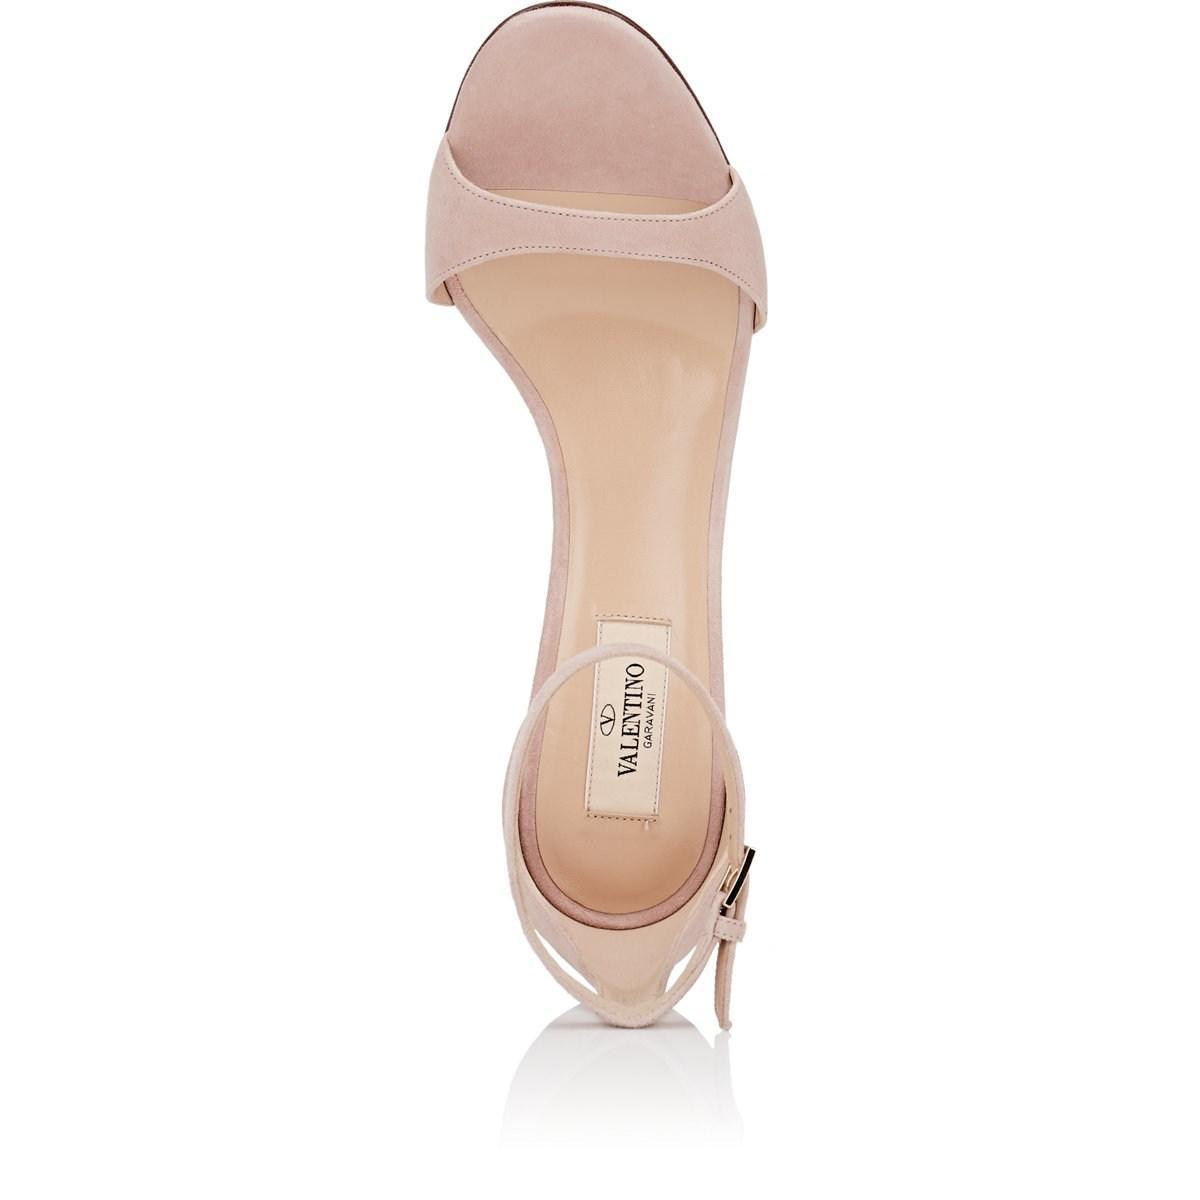 2bf914fd8cb9 Valentino - Multicolor Acrylic-glass-heel Suede Sandals - Lyst. View  fullscreen